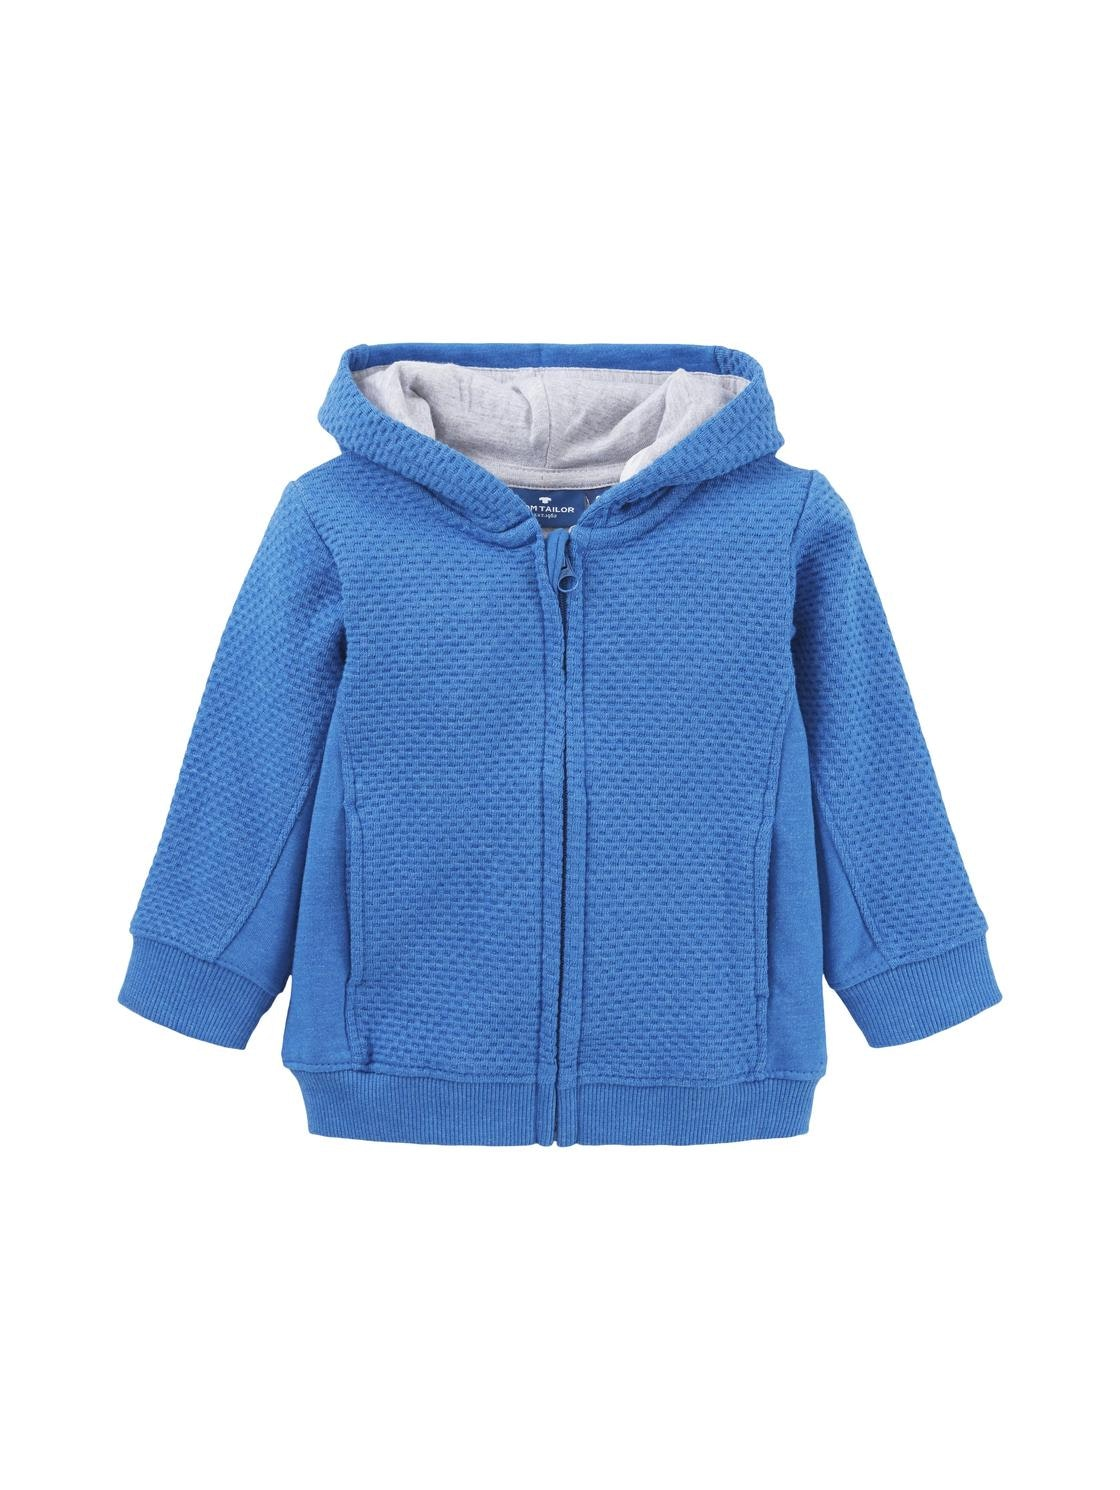 sweatjacket patterned, turkish sea-blue